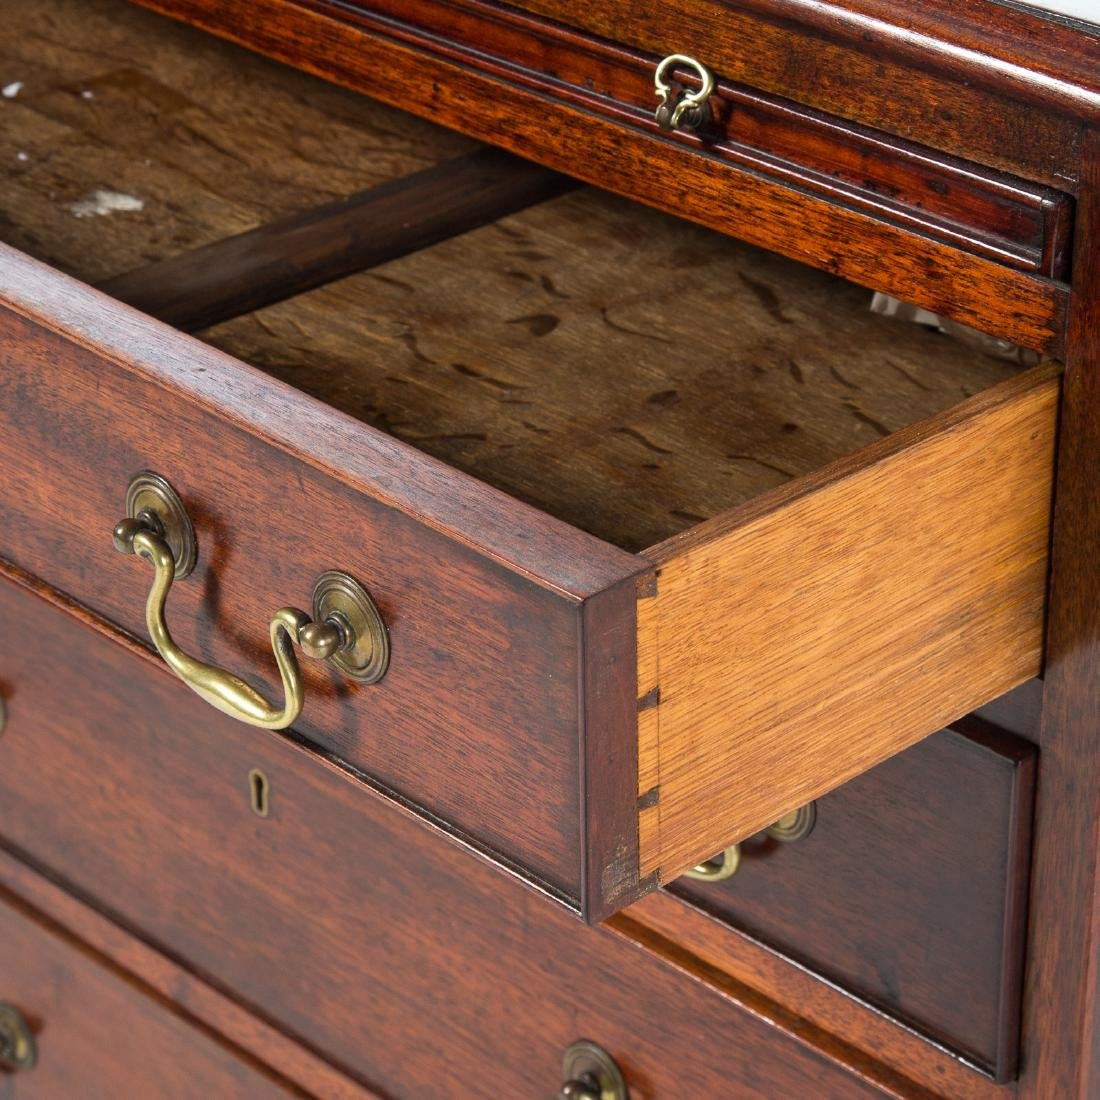 George III style mahogany bachelor's chest - 2